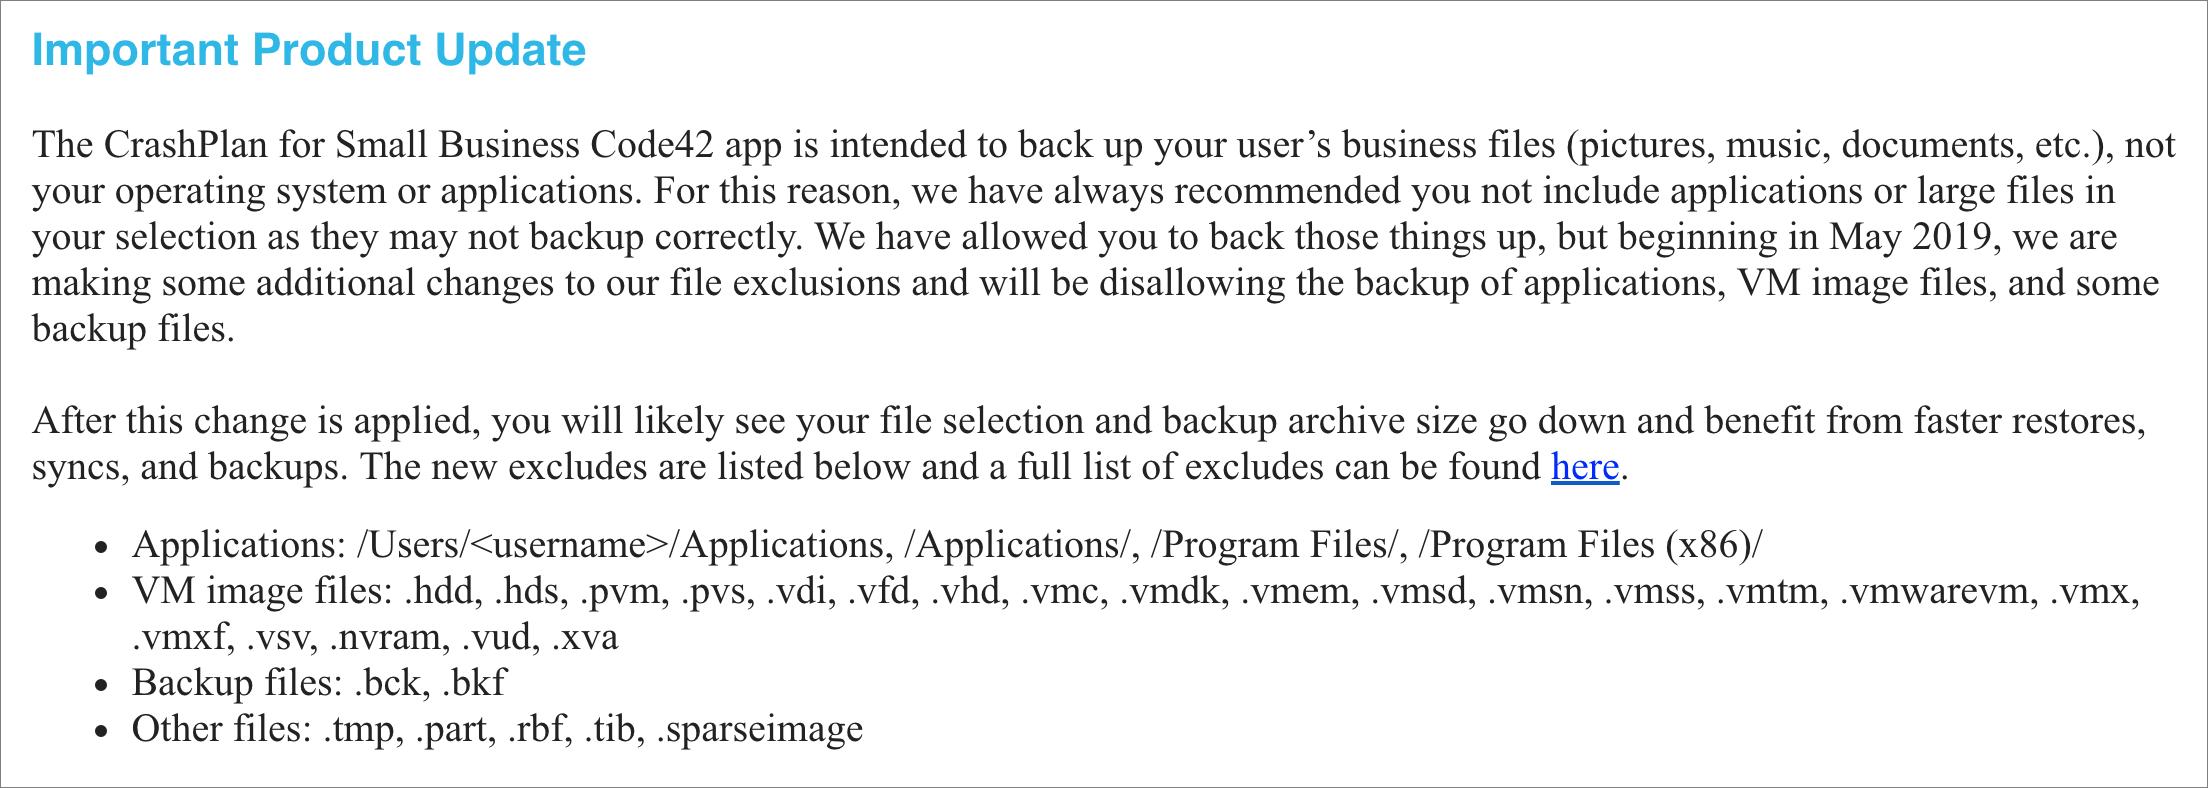 Backing Up VM Image Files to Internet Backup Services - TidBITS